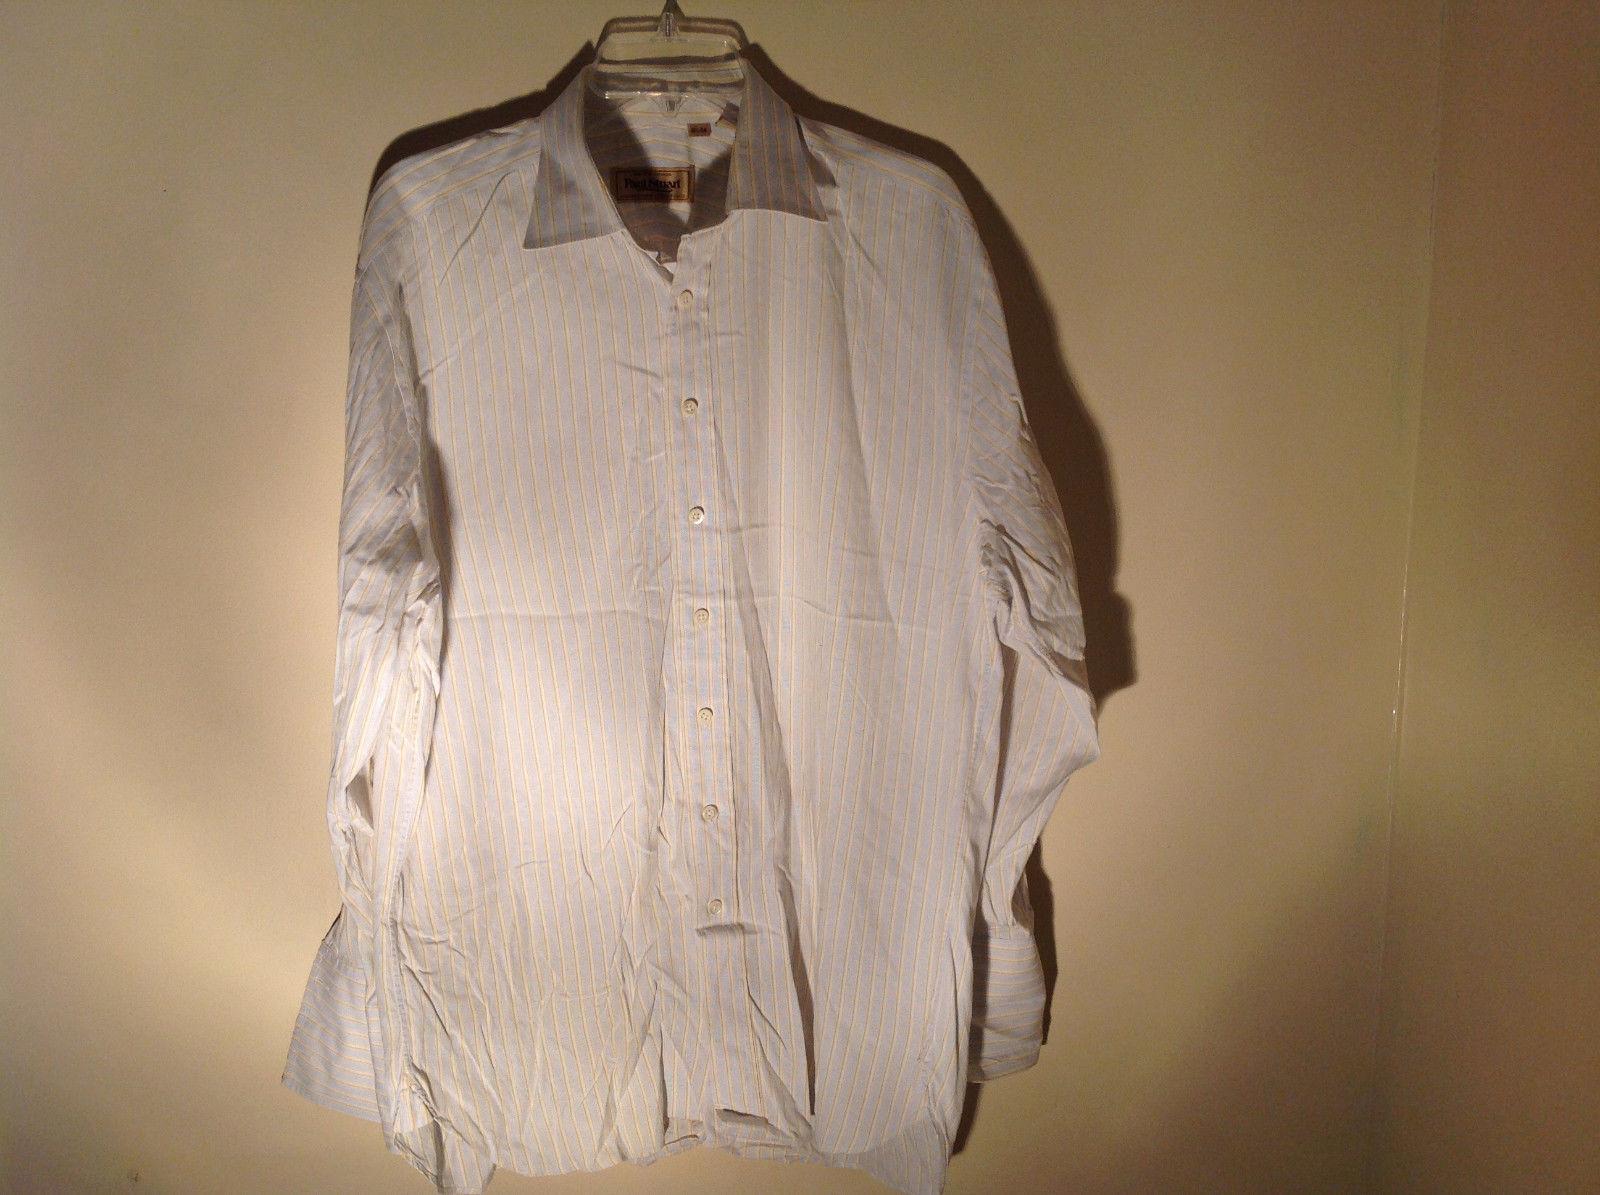 Paul Stuart Light Blue and Yellow Stripes Long Sleeve Button Up Shirt Size 16.5